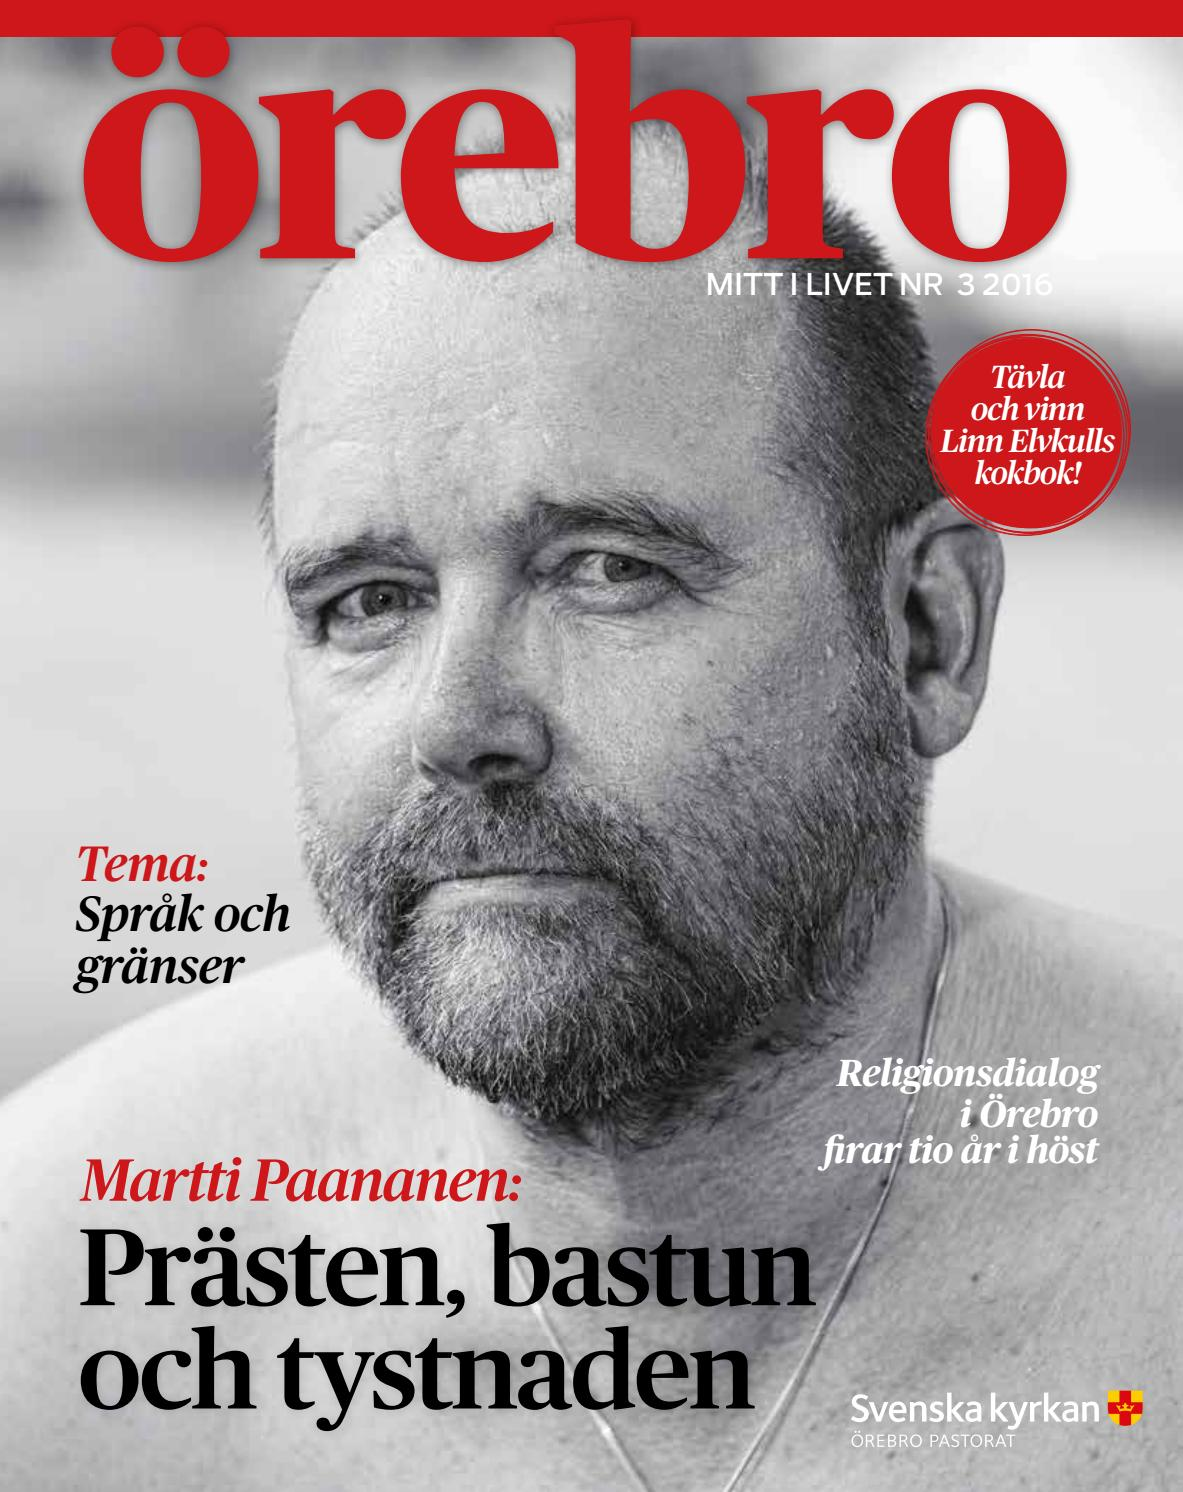 Frelsning: Tobias Karlsson Inte alltid en dans p rosor